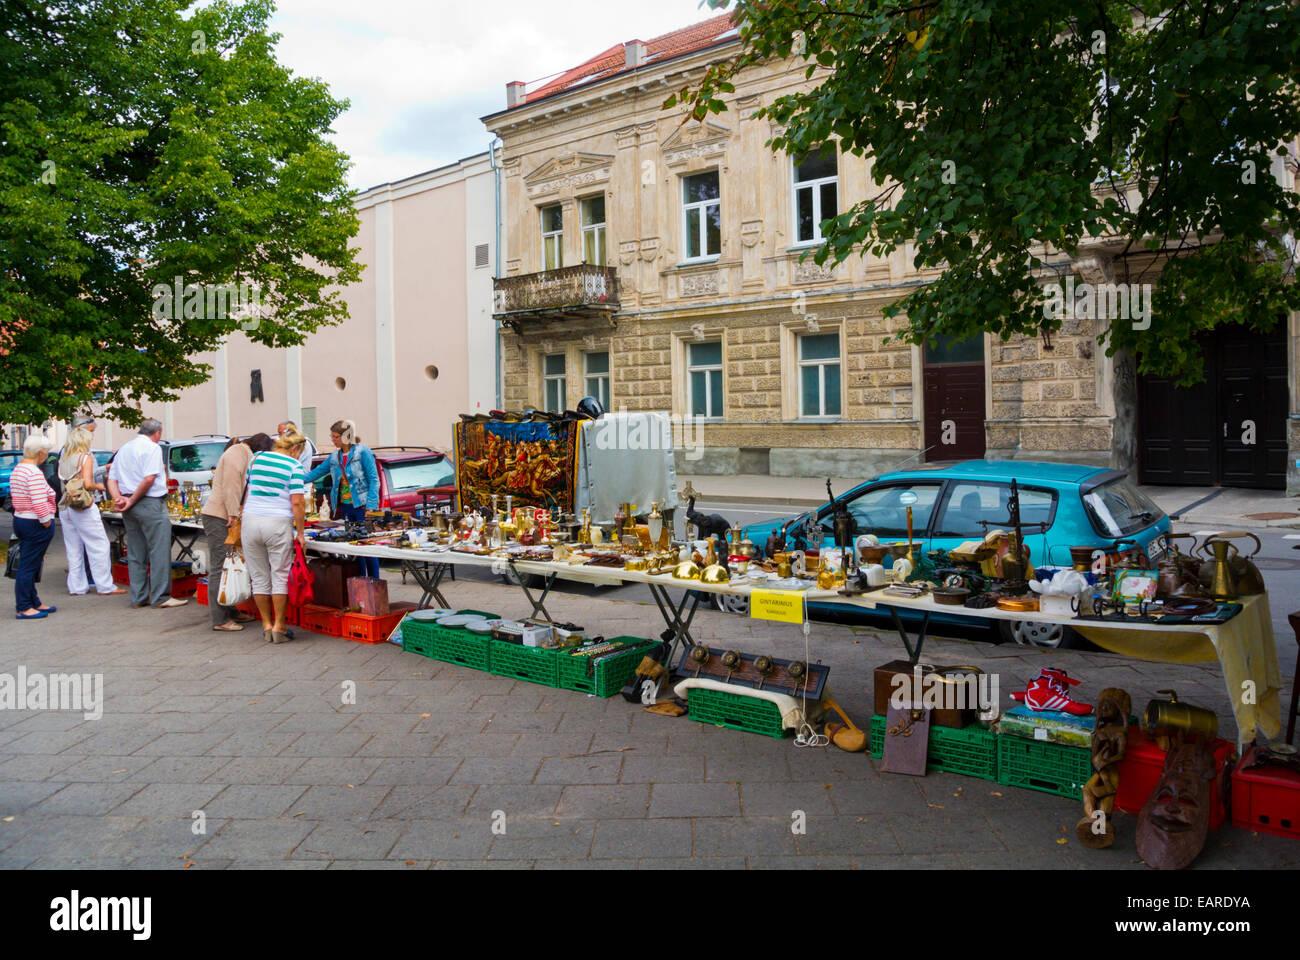 Flea market, Lazdynu Peledos skveras park, old town, Vilnius, Lithuania, Europe - Stock Image